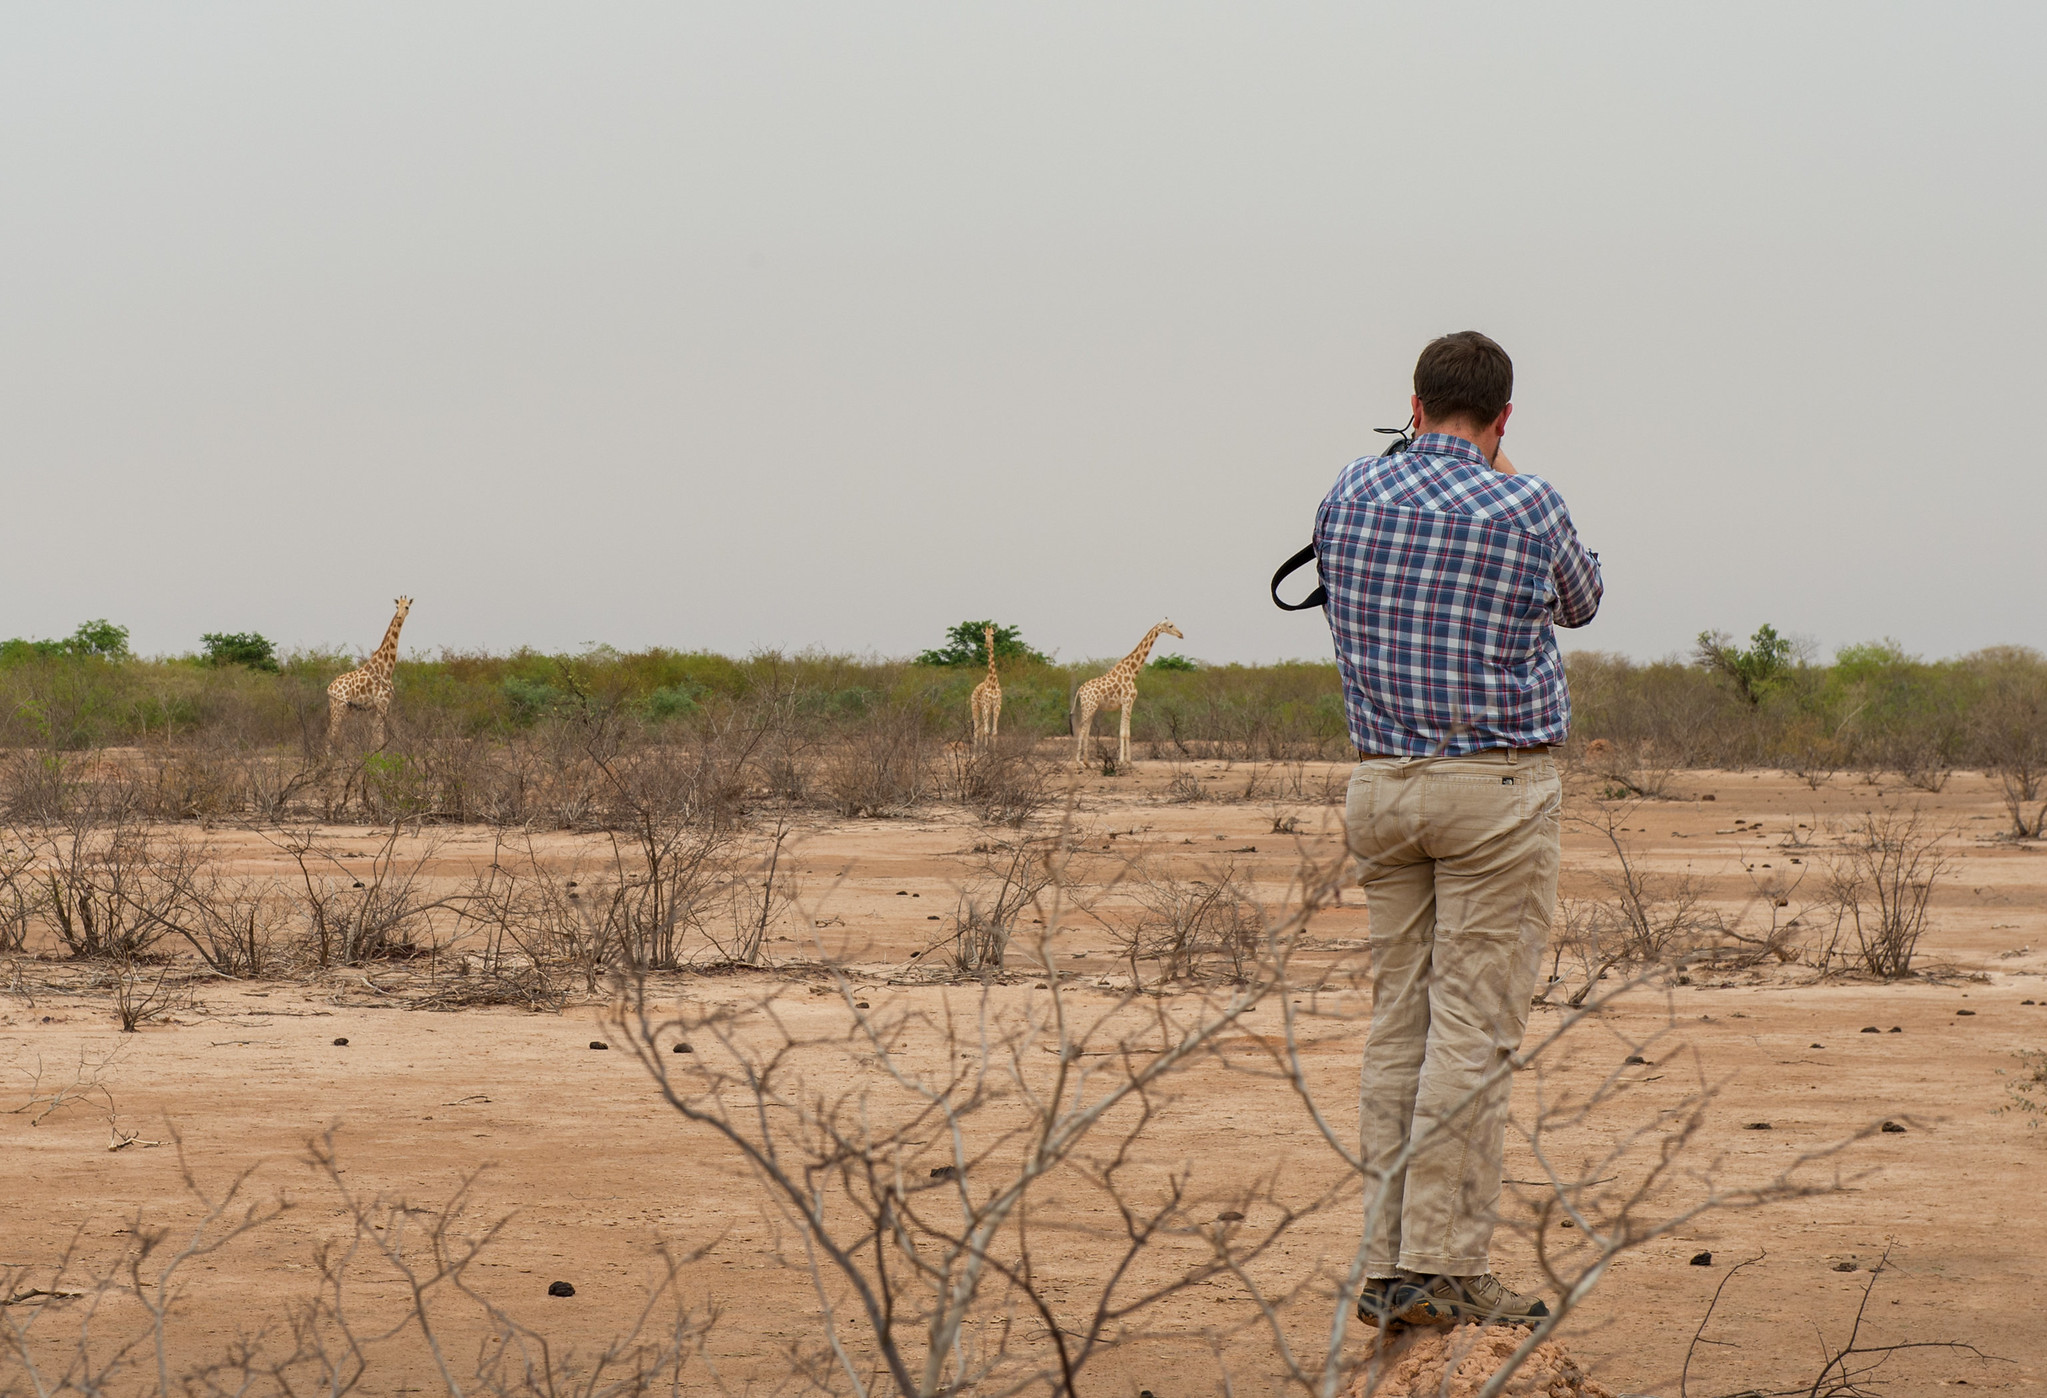 Capturing photos of the Last Herd